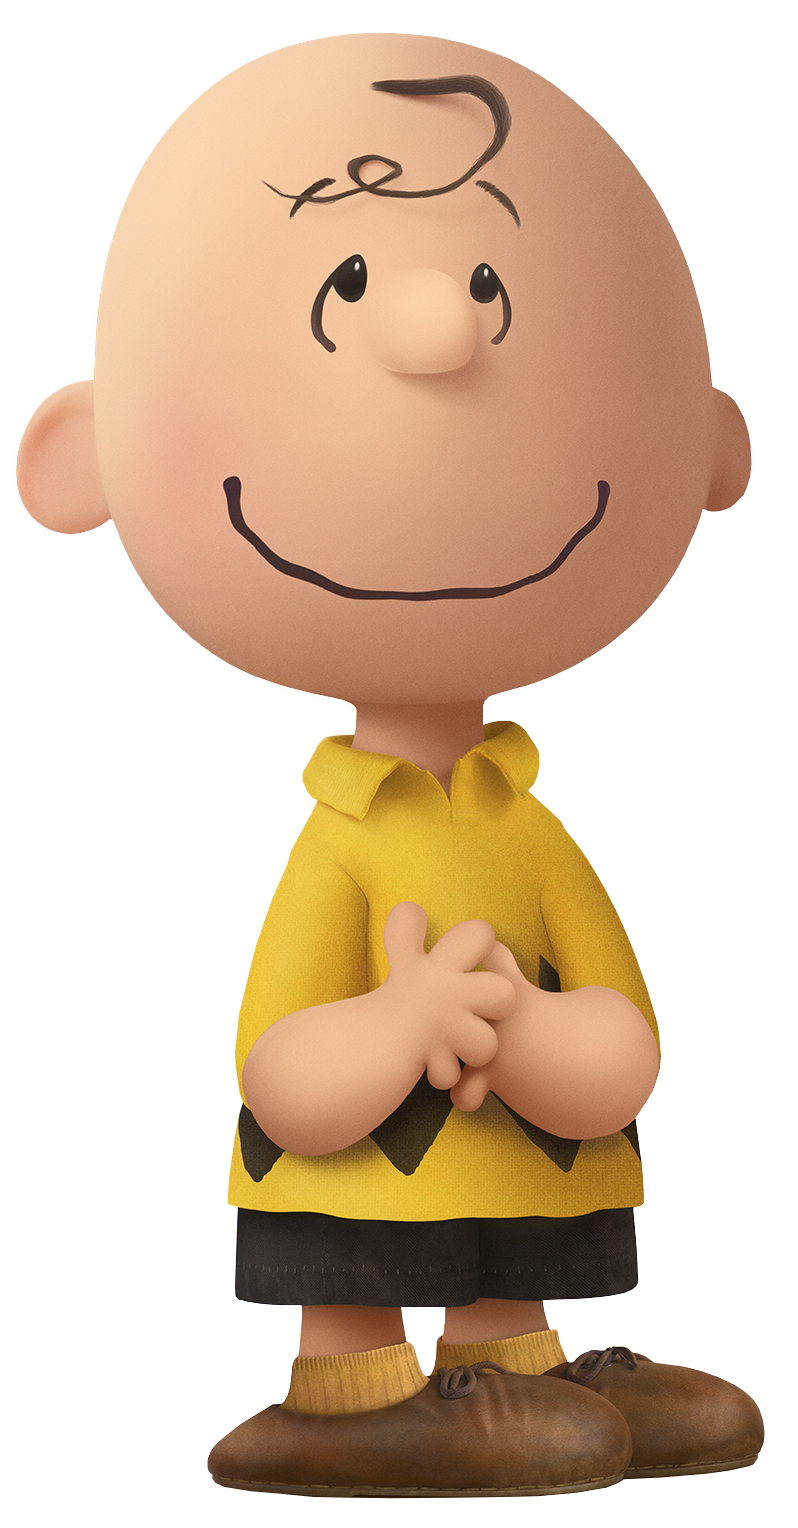 Charlie Brown The Peanuts Movie Transparent Cartoon.